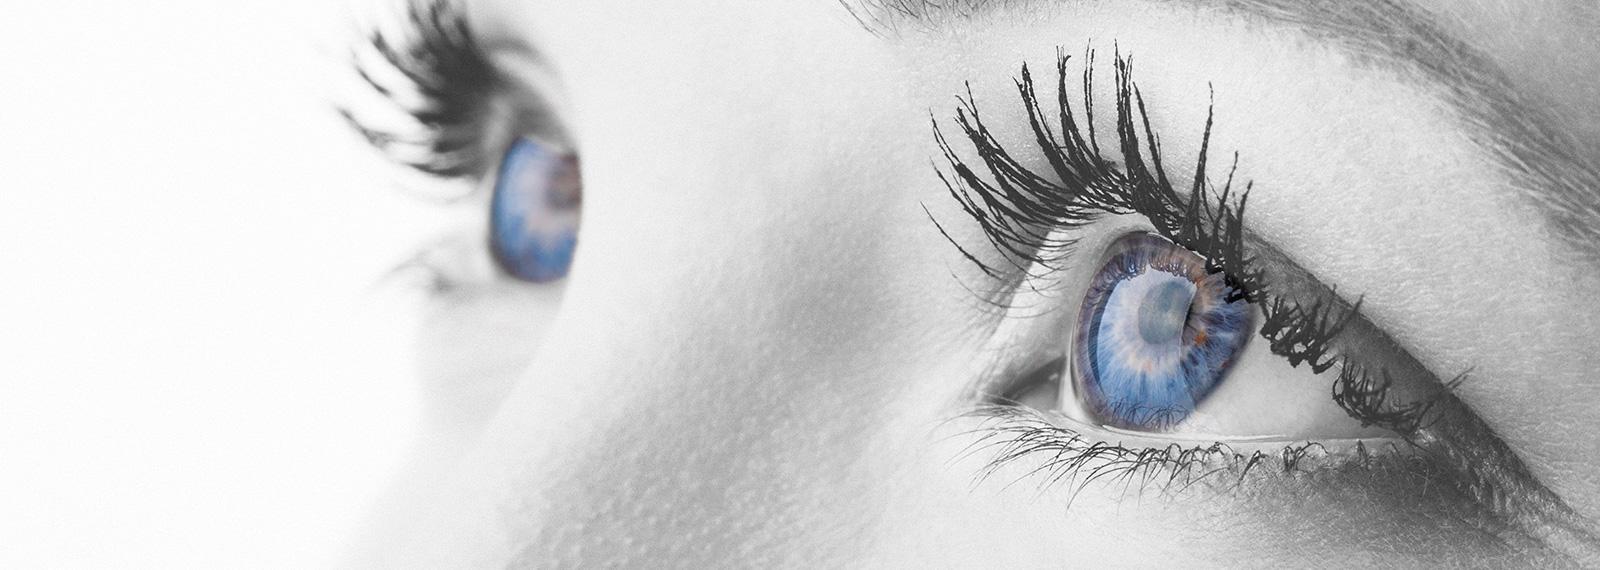 Safe Amp Efficient Lasik Eye Surgery Dr John Frangie